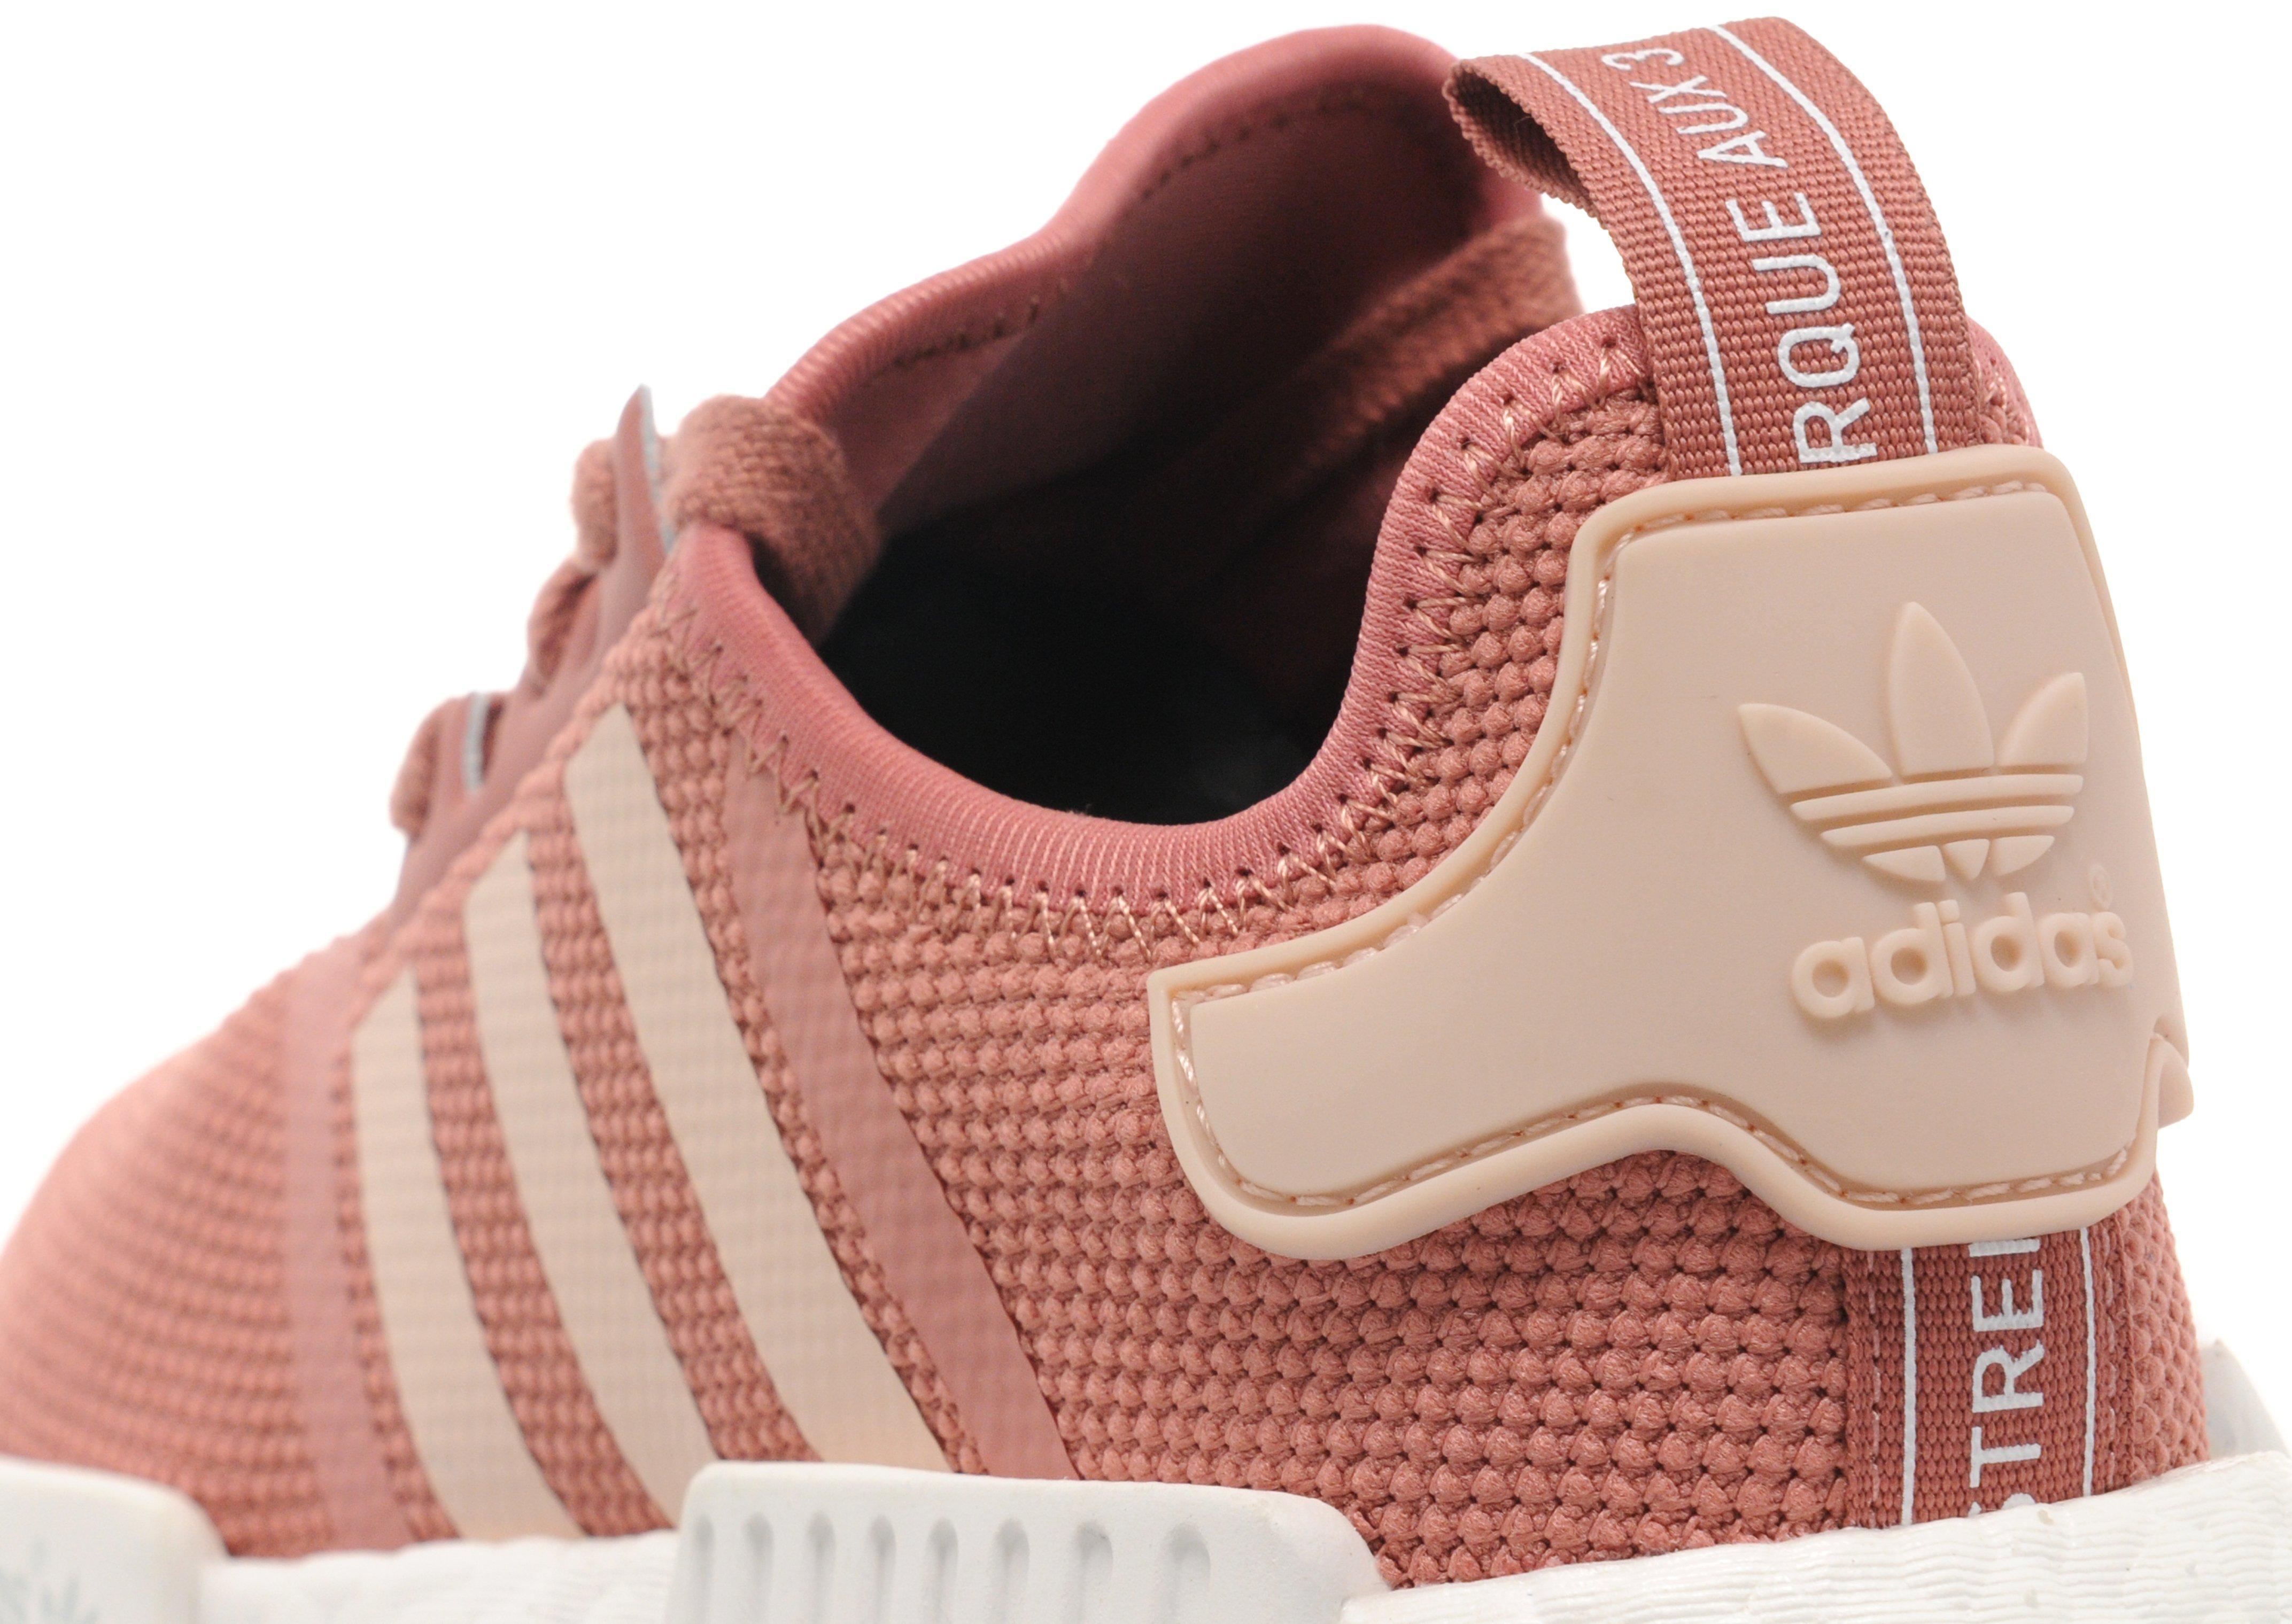 adidas nmd runner pink